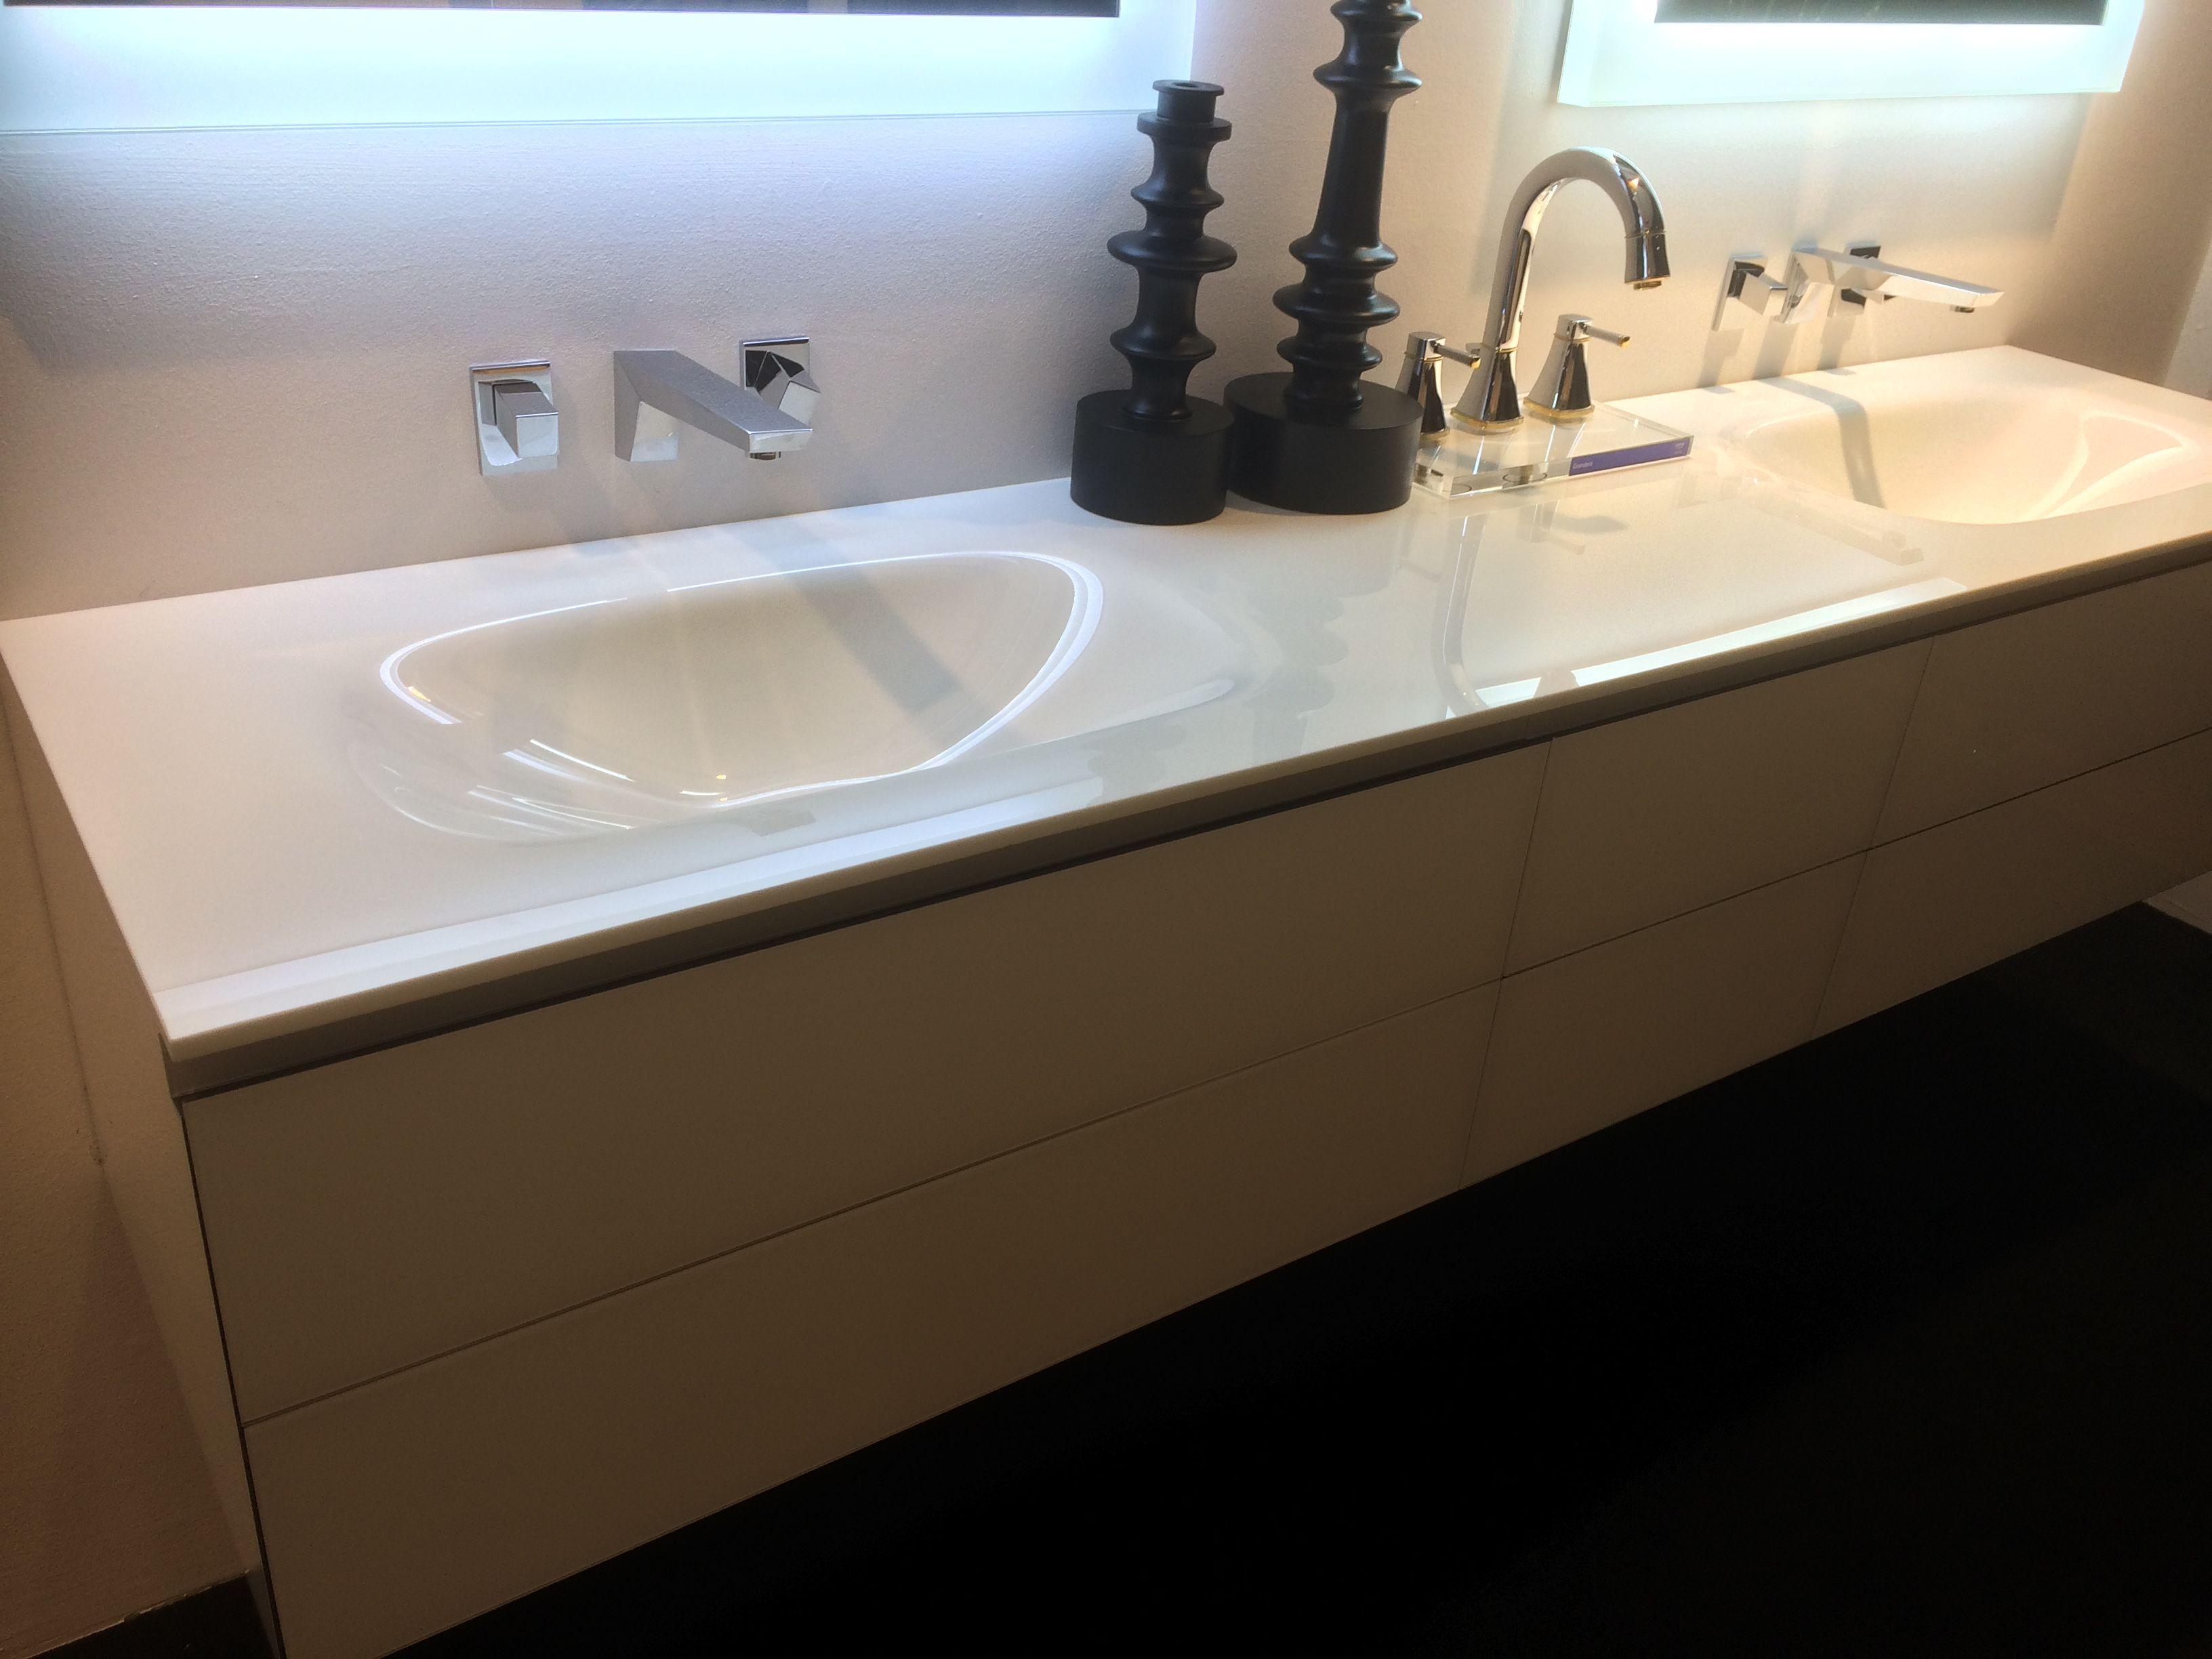 Badezimmer deckenstrahler ~ Pin by daniela pausackl on badezimmer wc